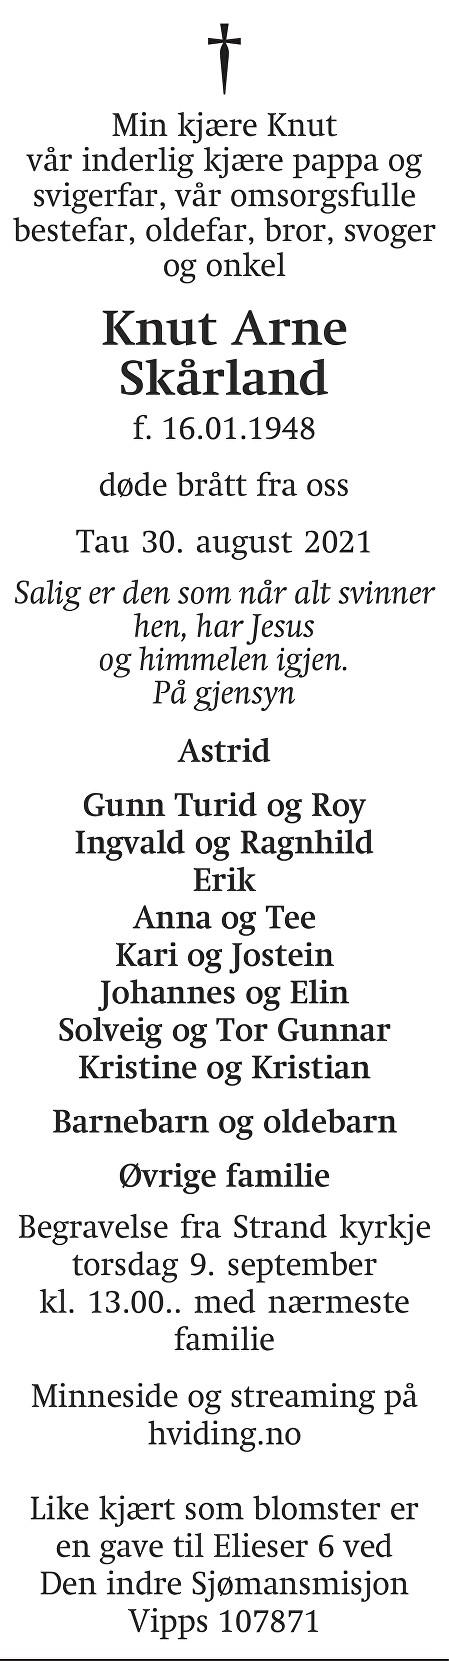 Knut Arne Skårland Dødsannonse